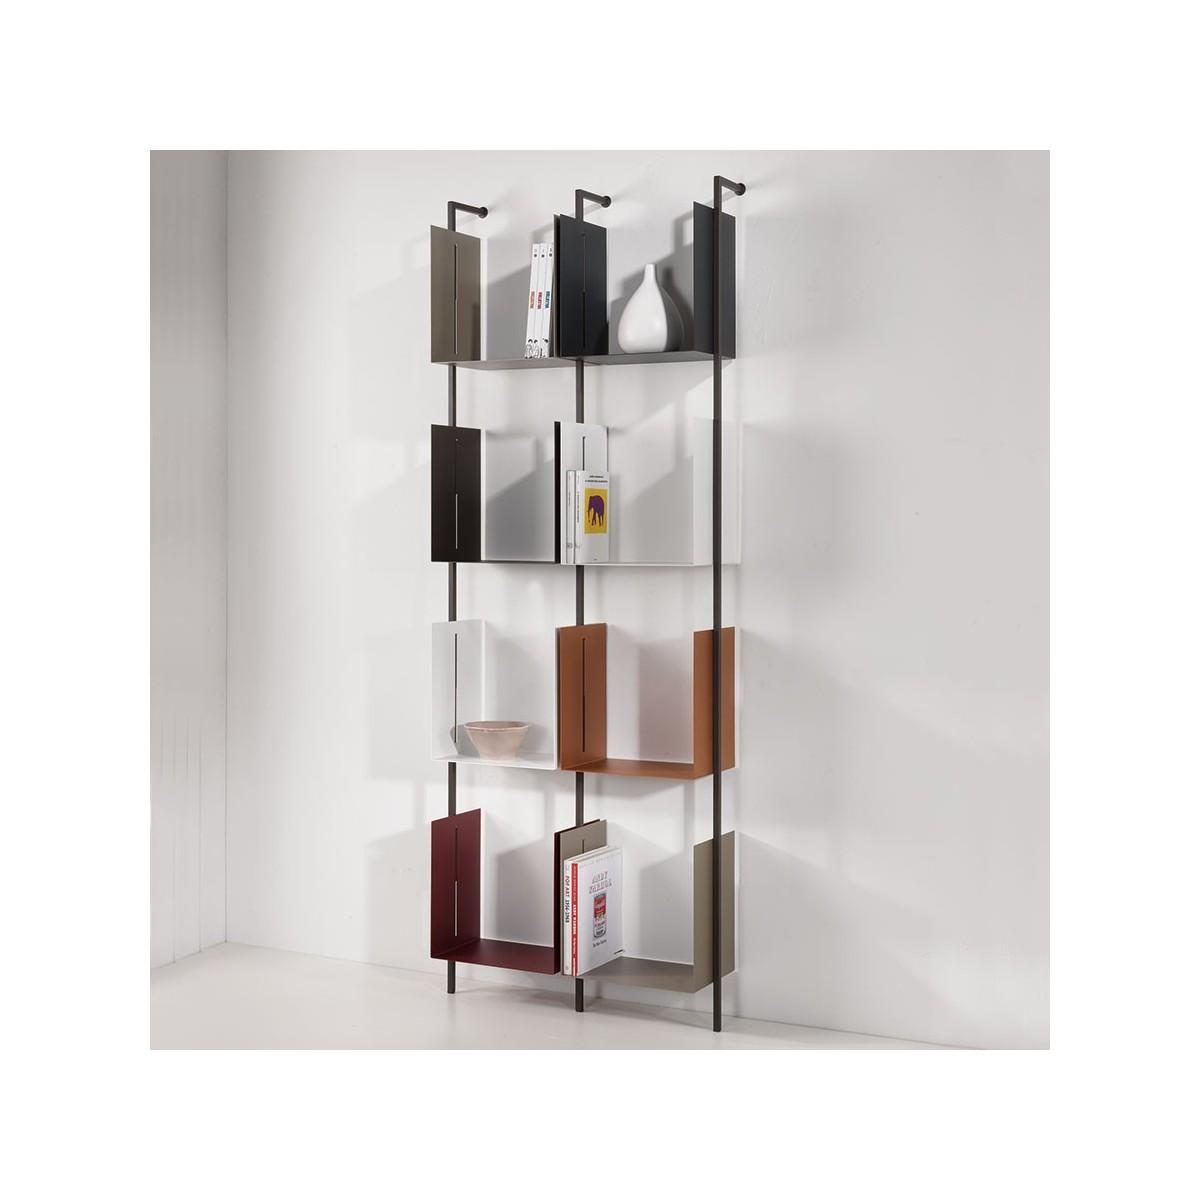 Libreria libra comp 21 verticale a parete design moderno - Libreria parete design ...